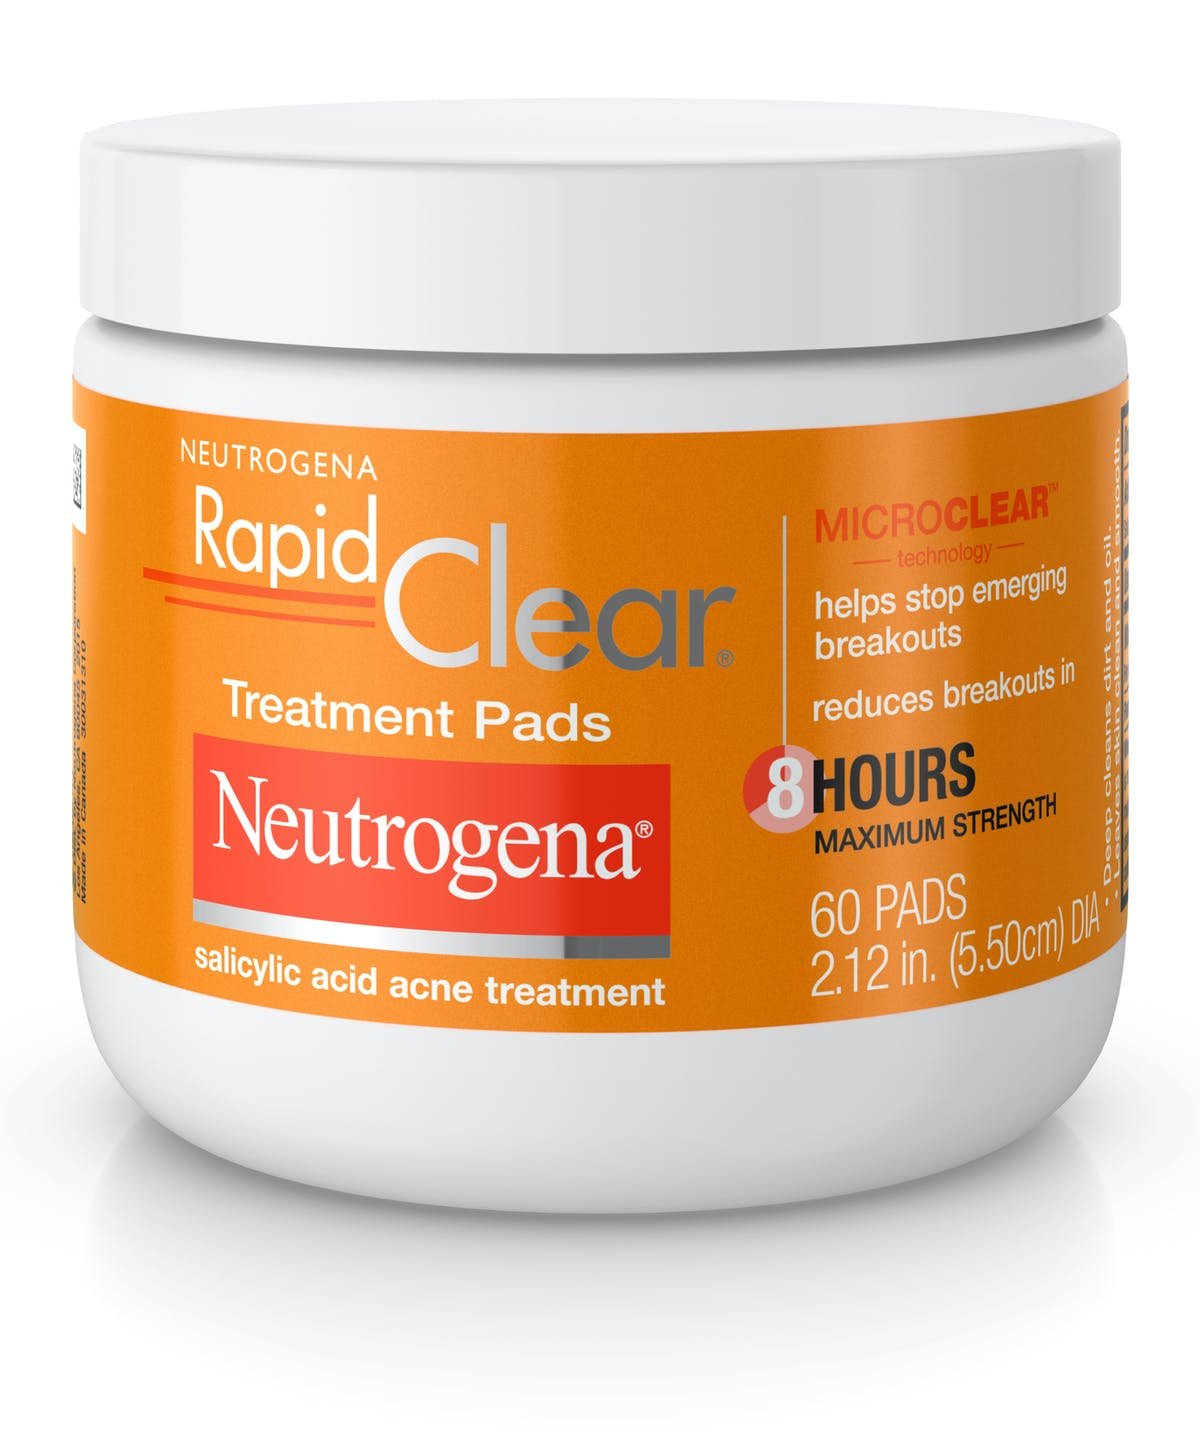 Neutrogena Rapid Clear Treatment Pads Neutrogena